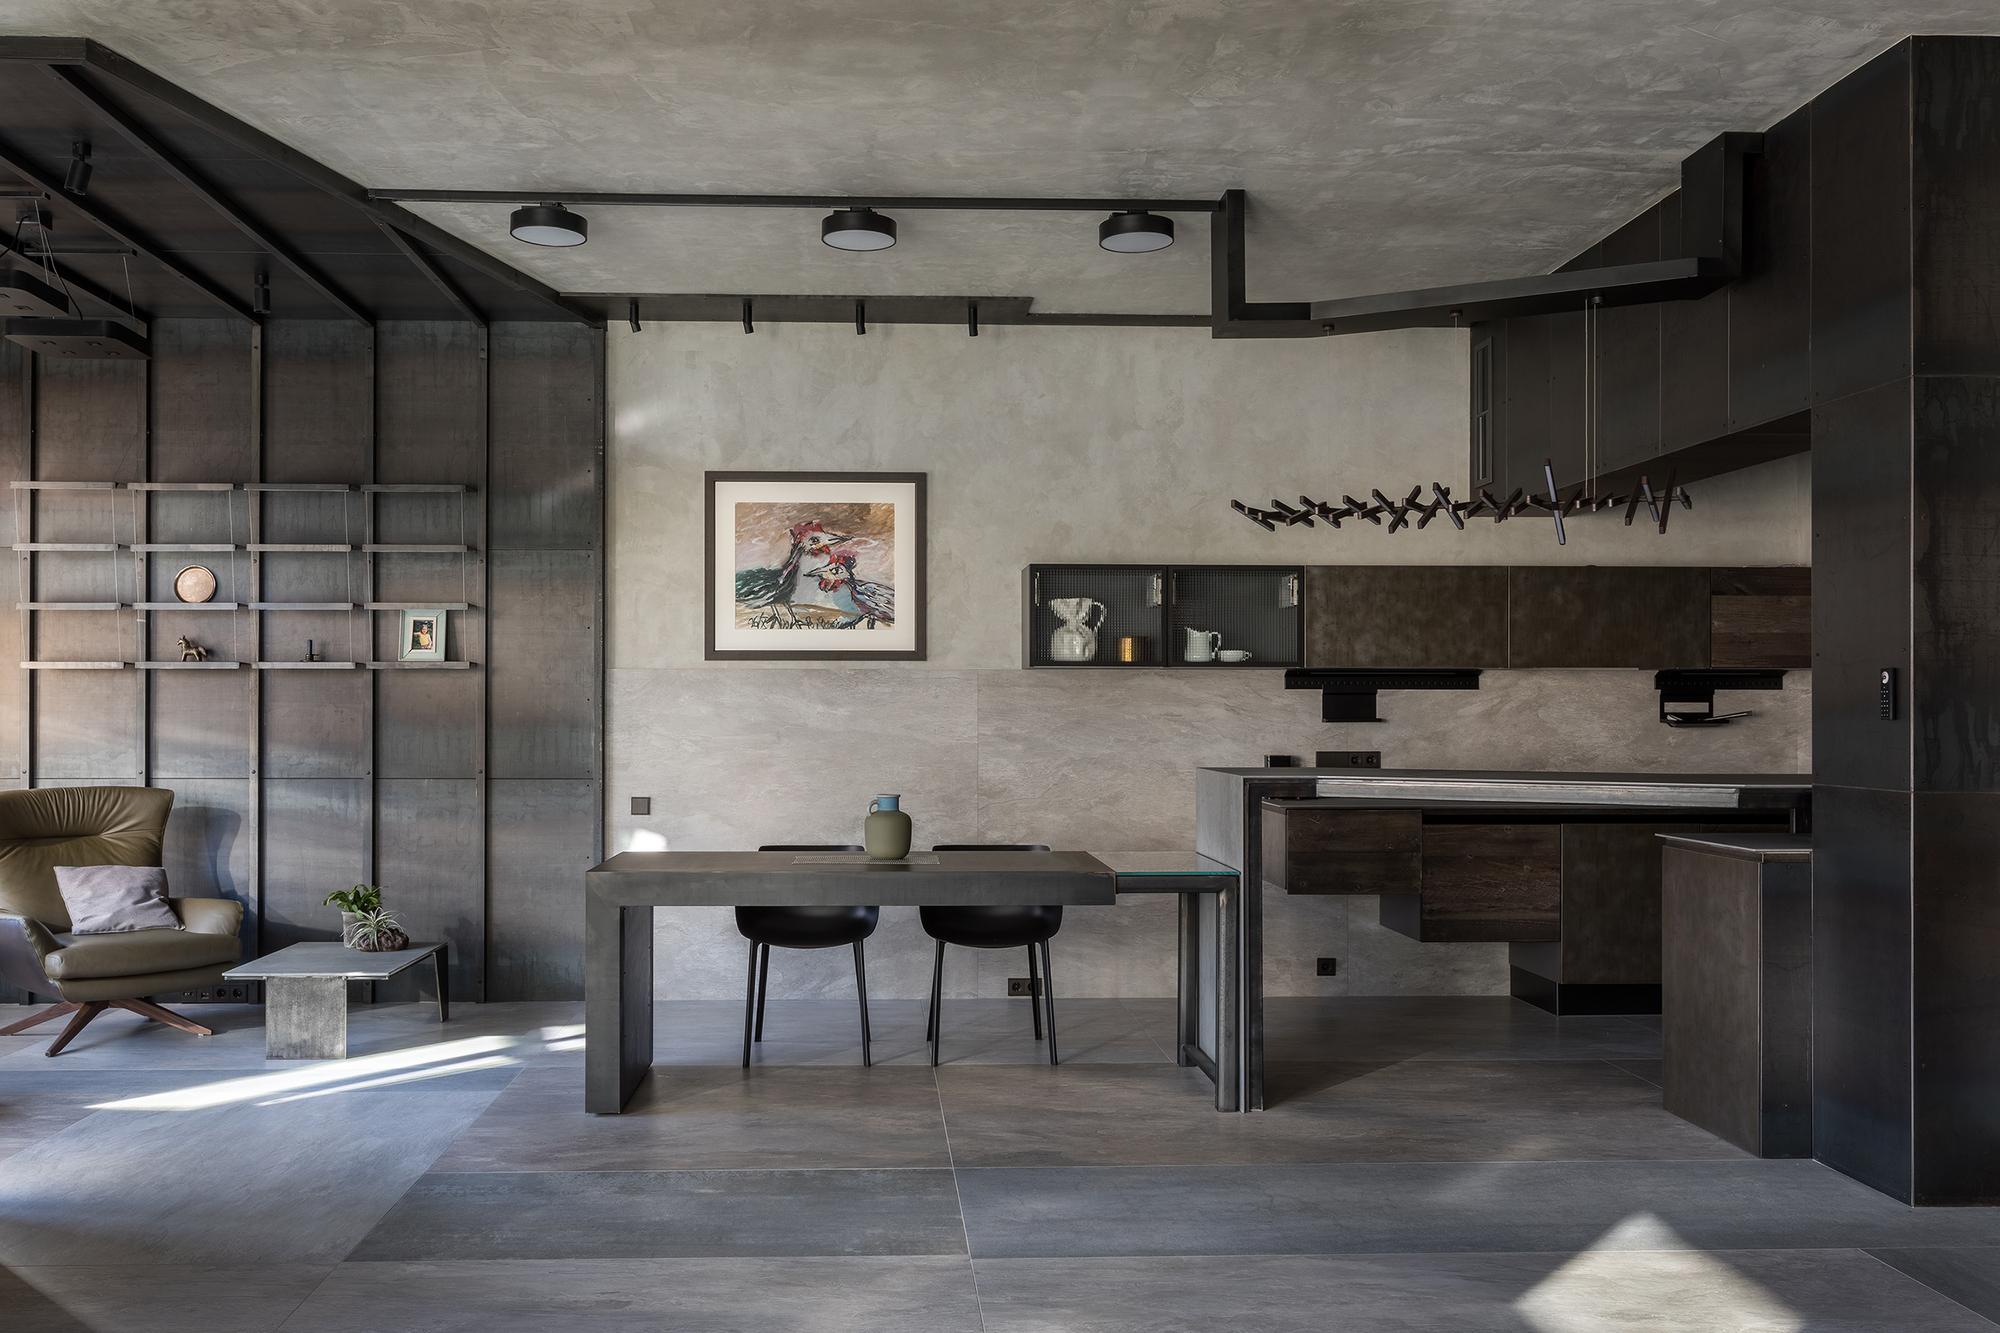 The Grey Interiors / Alexey Rozenberg